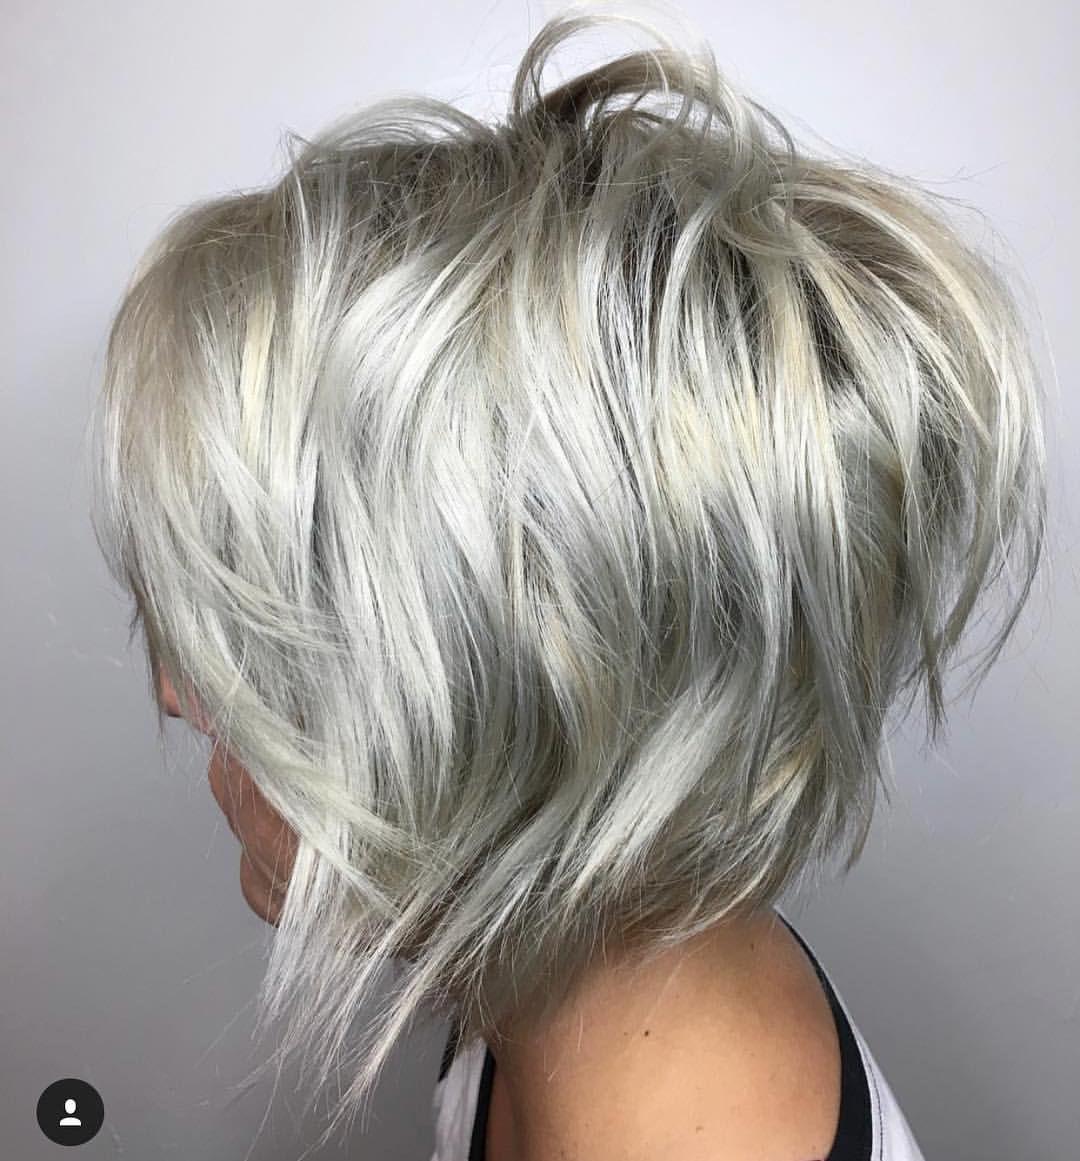 Pin by Marti Rae Kirk on hairdos | Hair styles 2016 ...